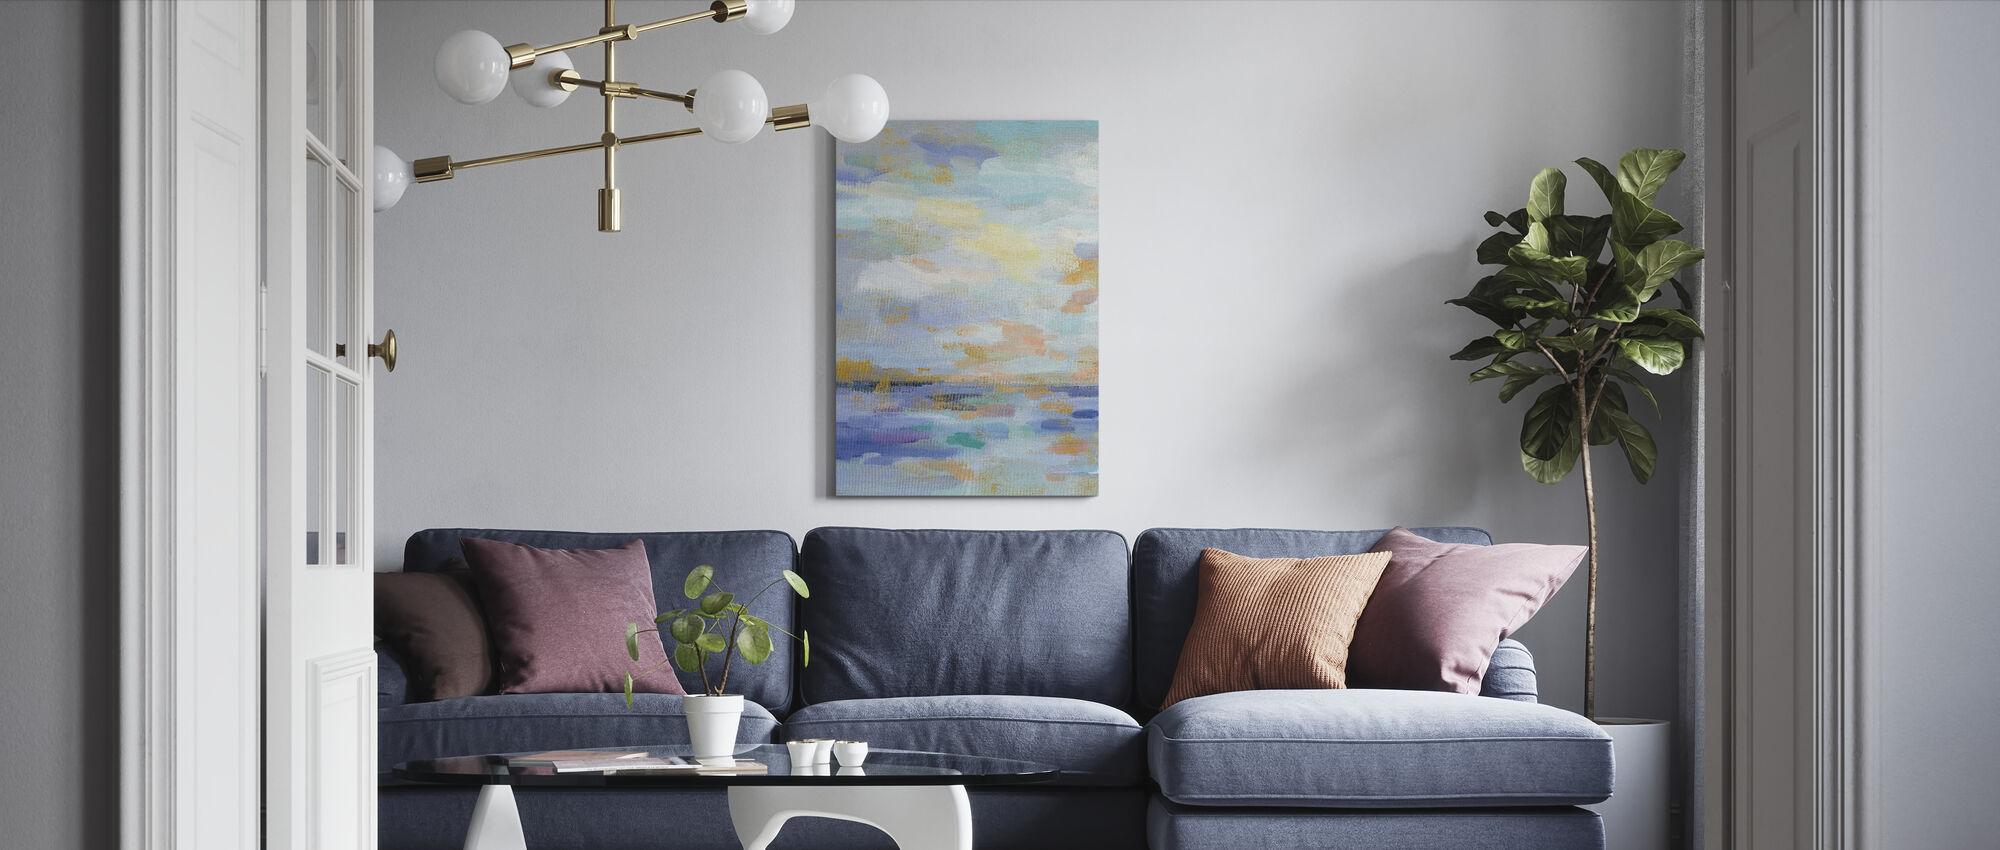 Golden Sunrise II - Canvas print - Living Room